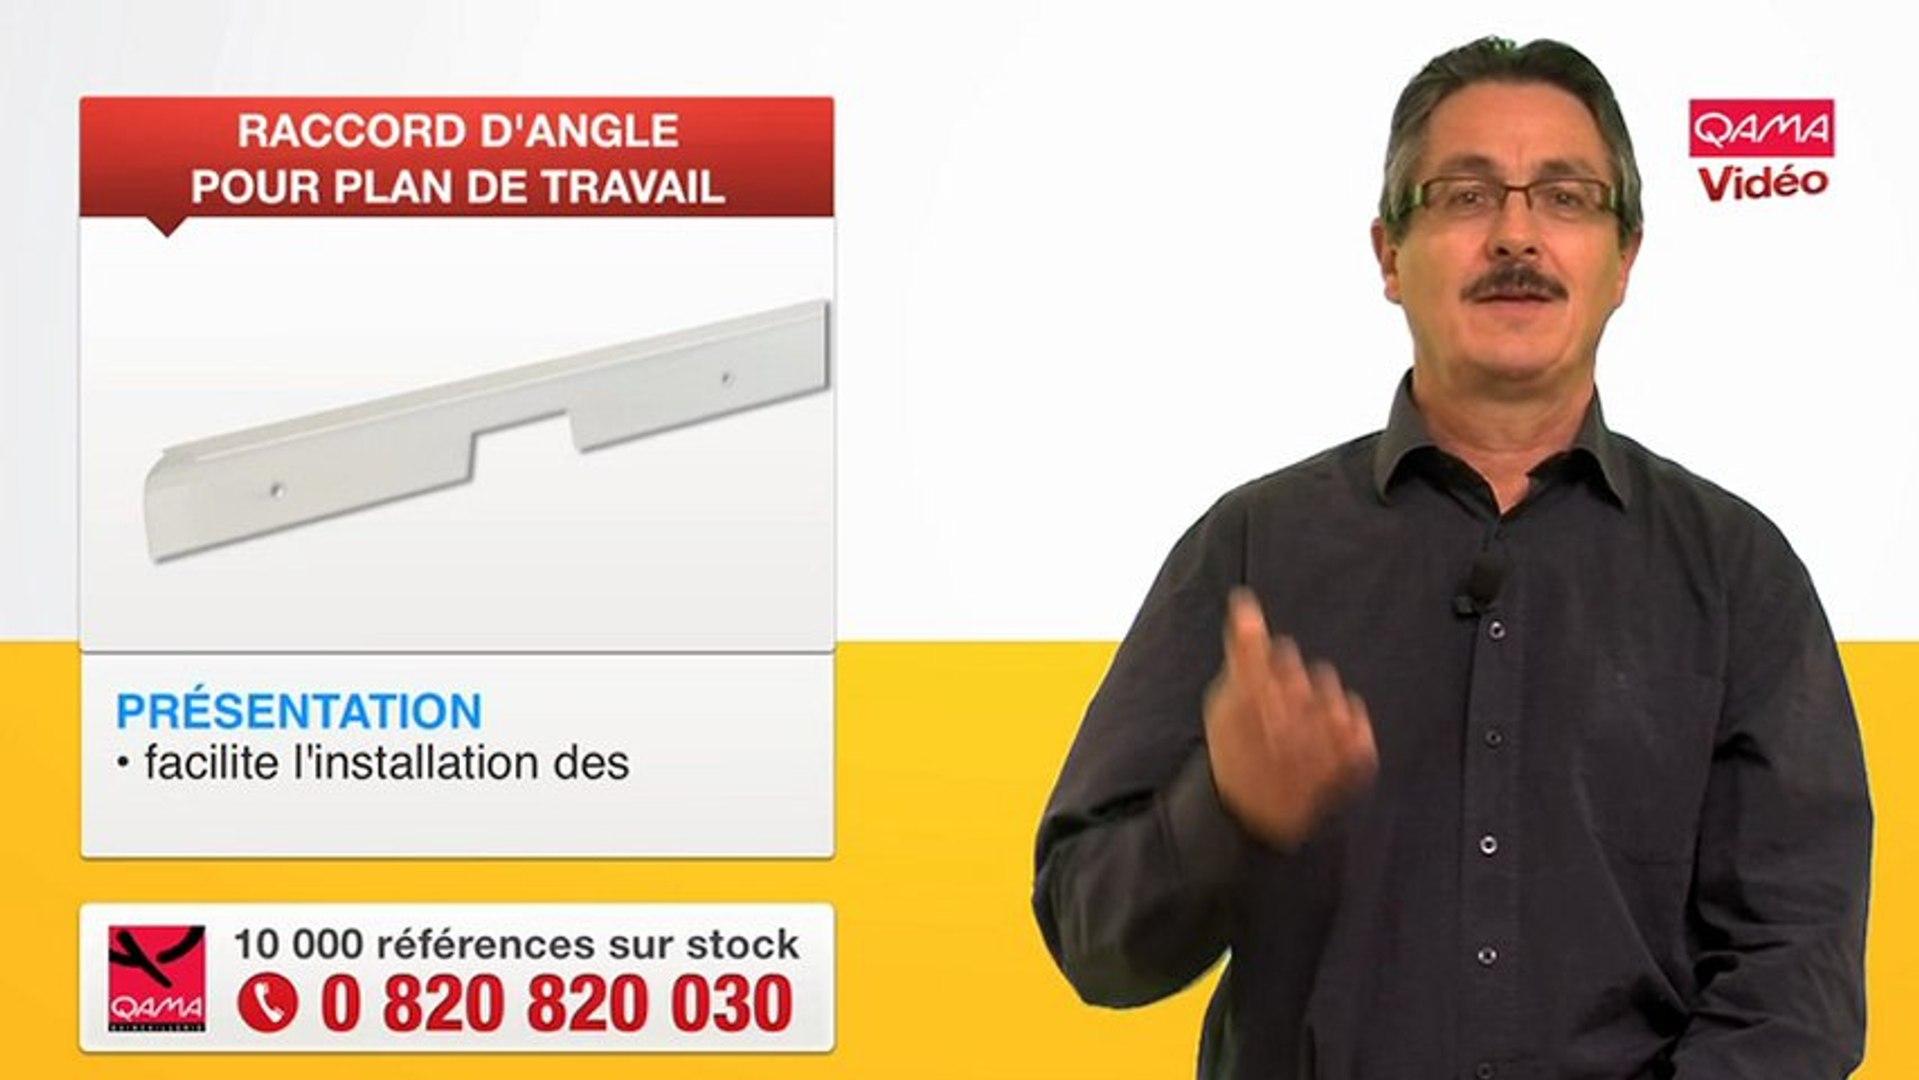 Raccord De Plan De Travail raccord d'angle en aluminium pour plan de travail, par qama